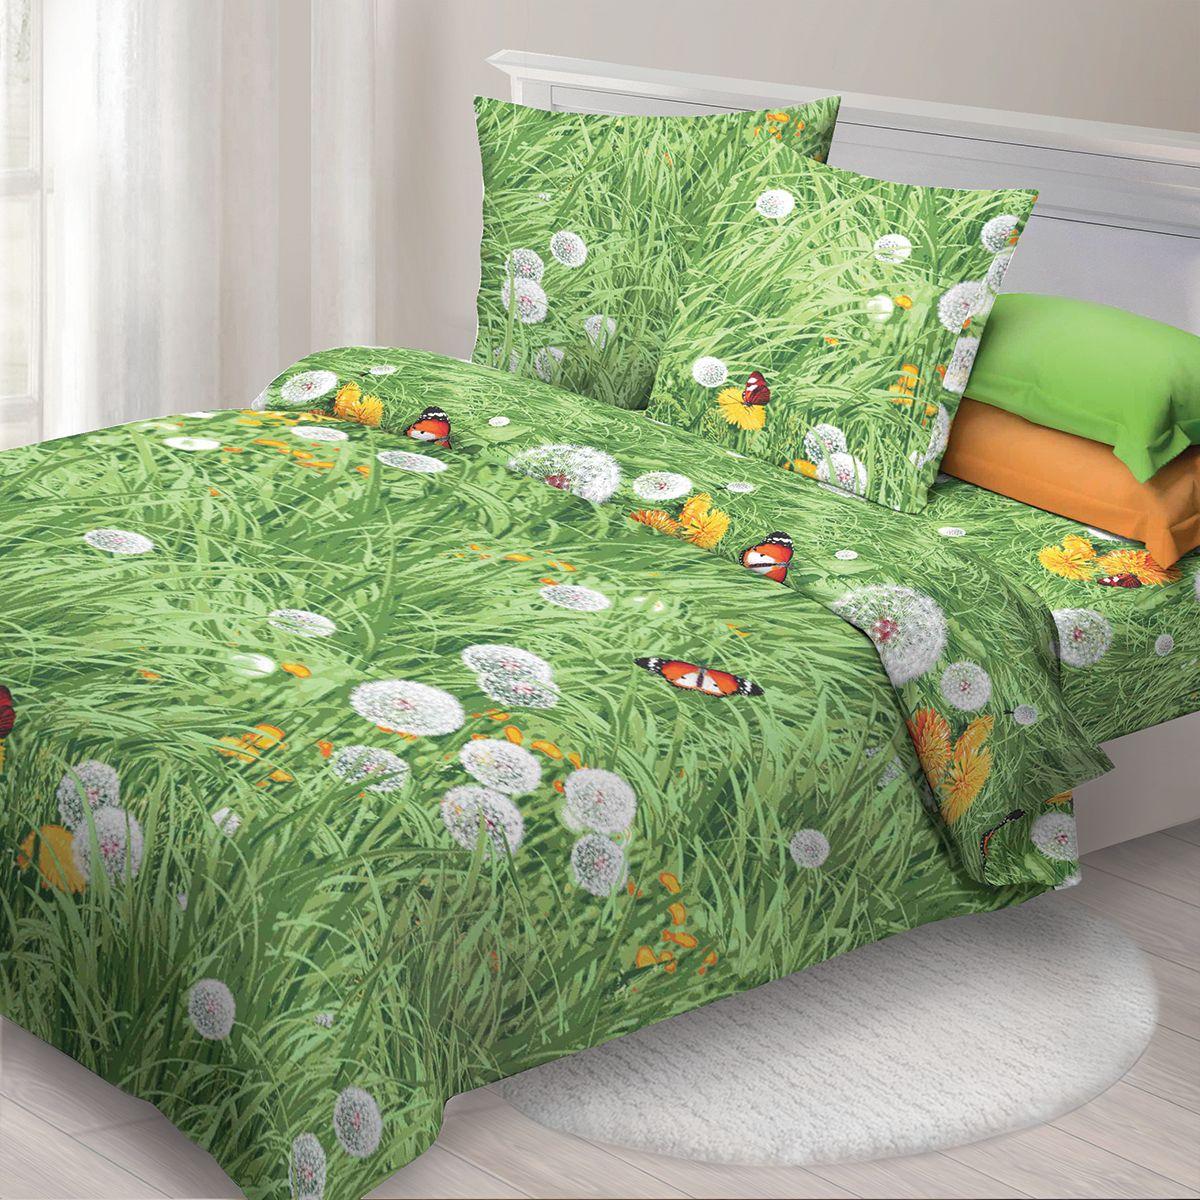 Комплект белья Спал Спалыч Одуванчики, 2-х спальное, наволочки 70x70, цвет: зеленый. 3619-184193